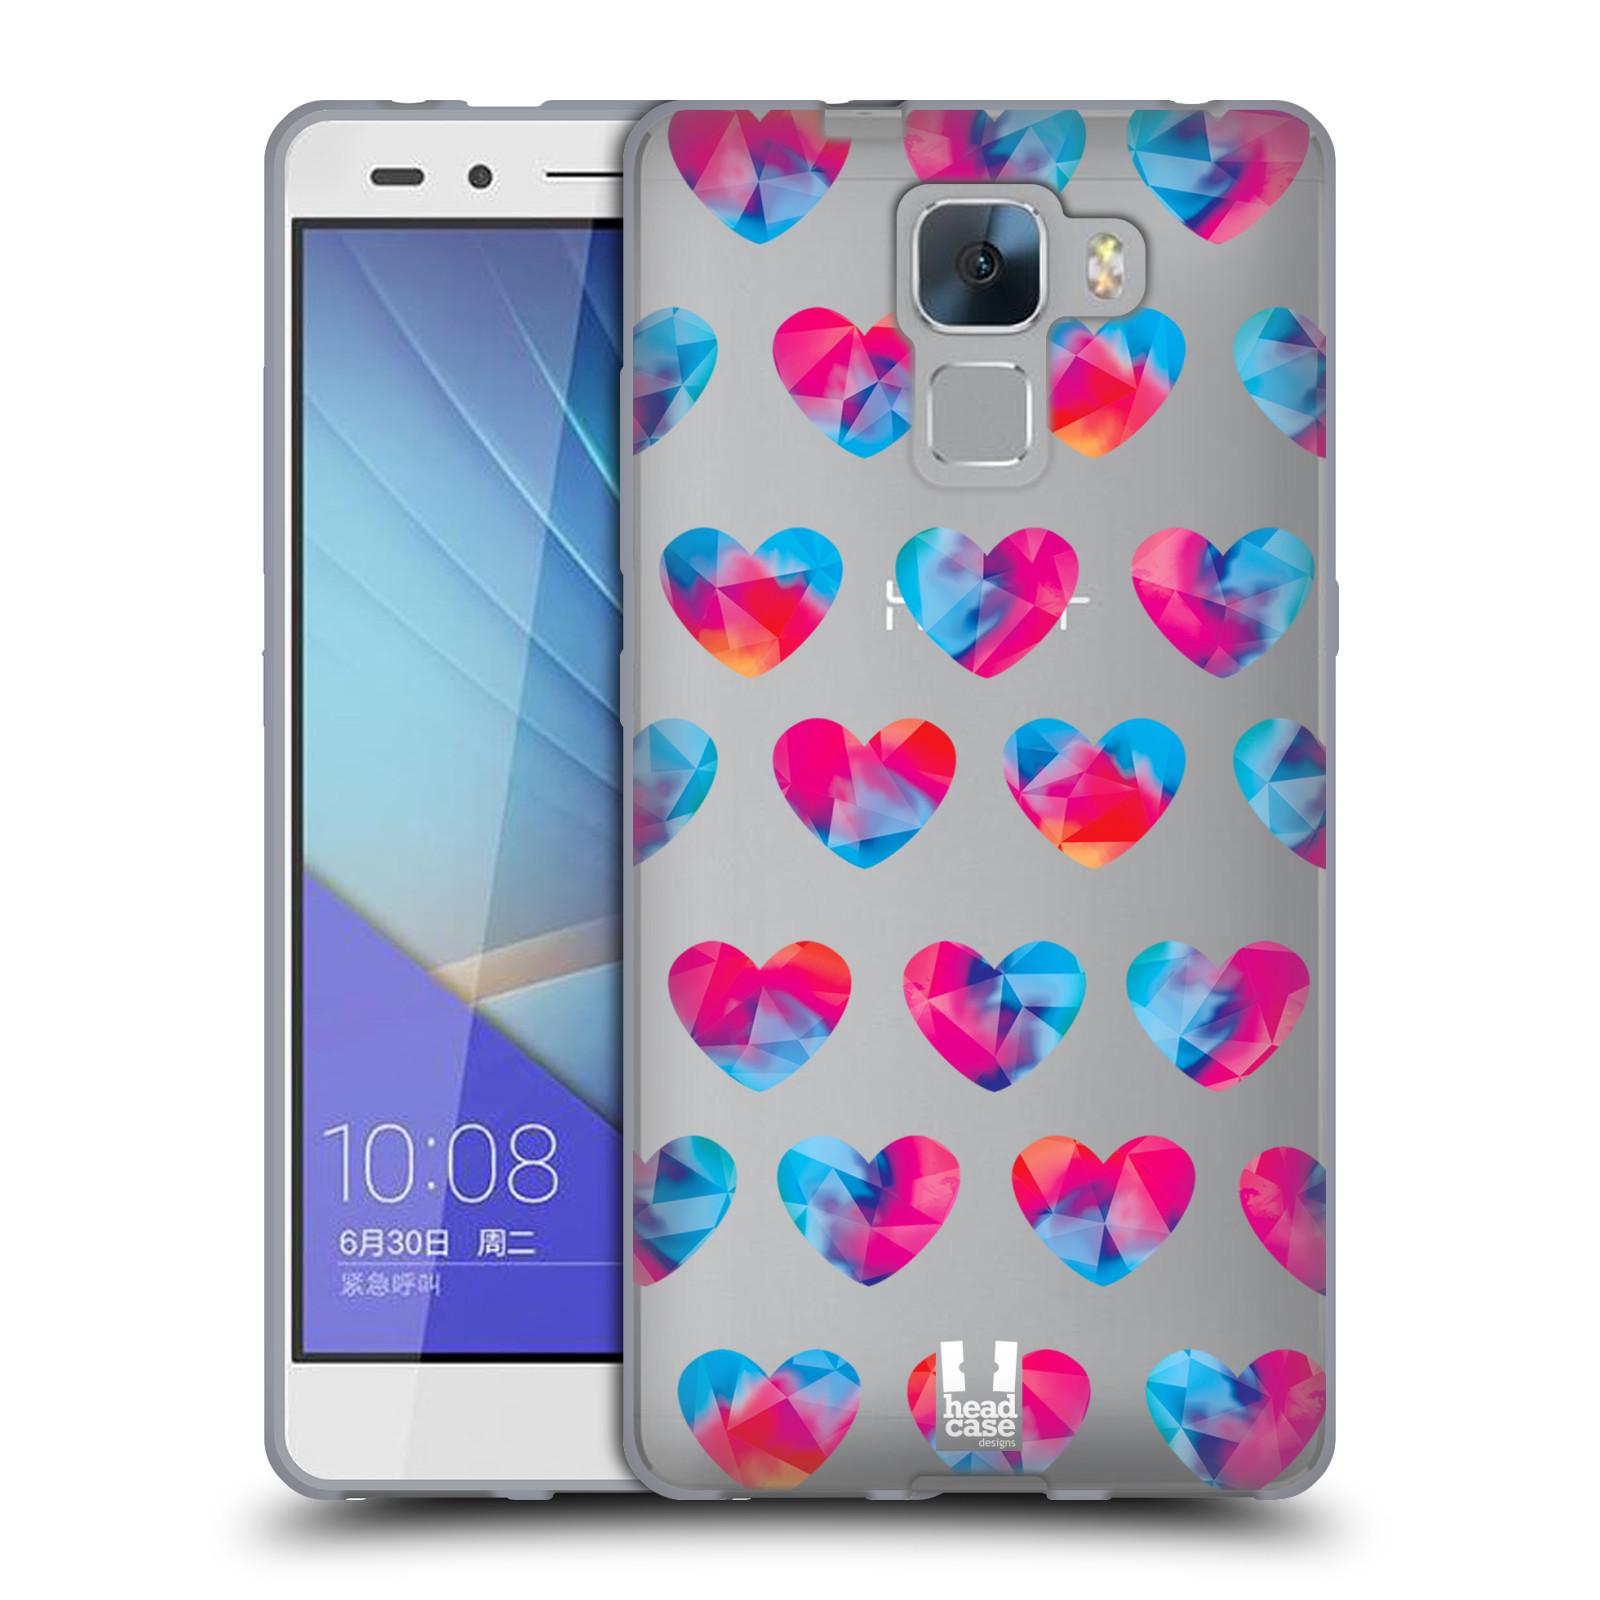 Silikonové pouzdro na mobil Honor 7 - Head Case - Srdíčka hrající barvami